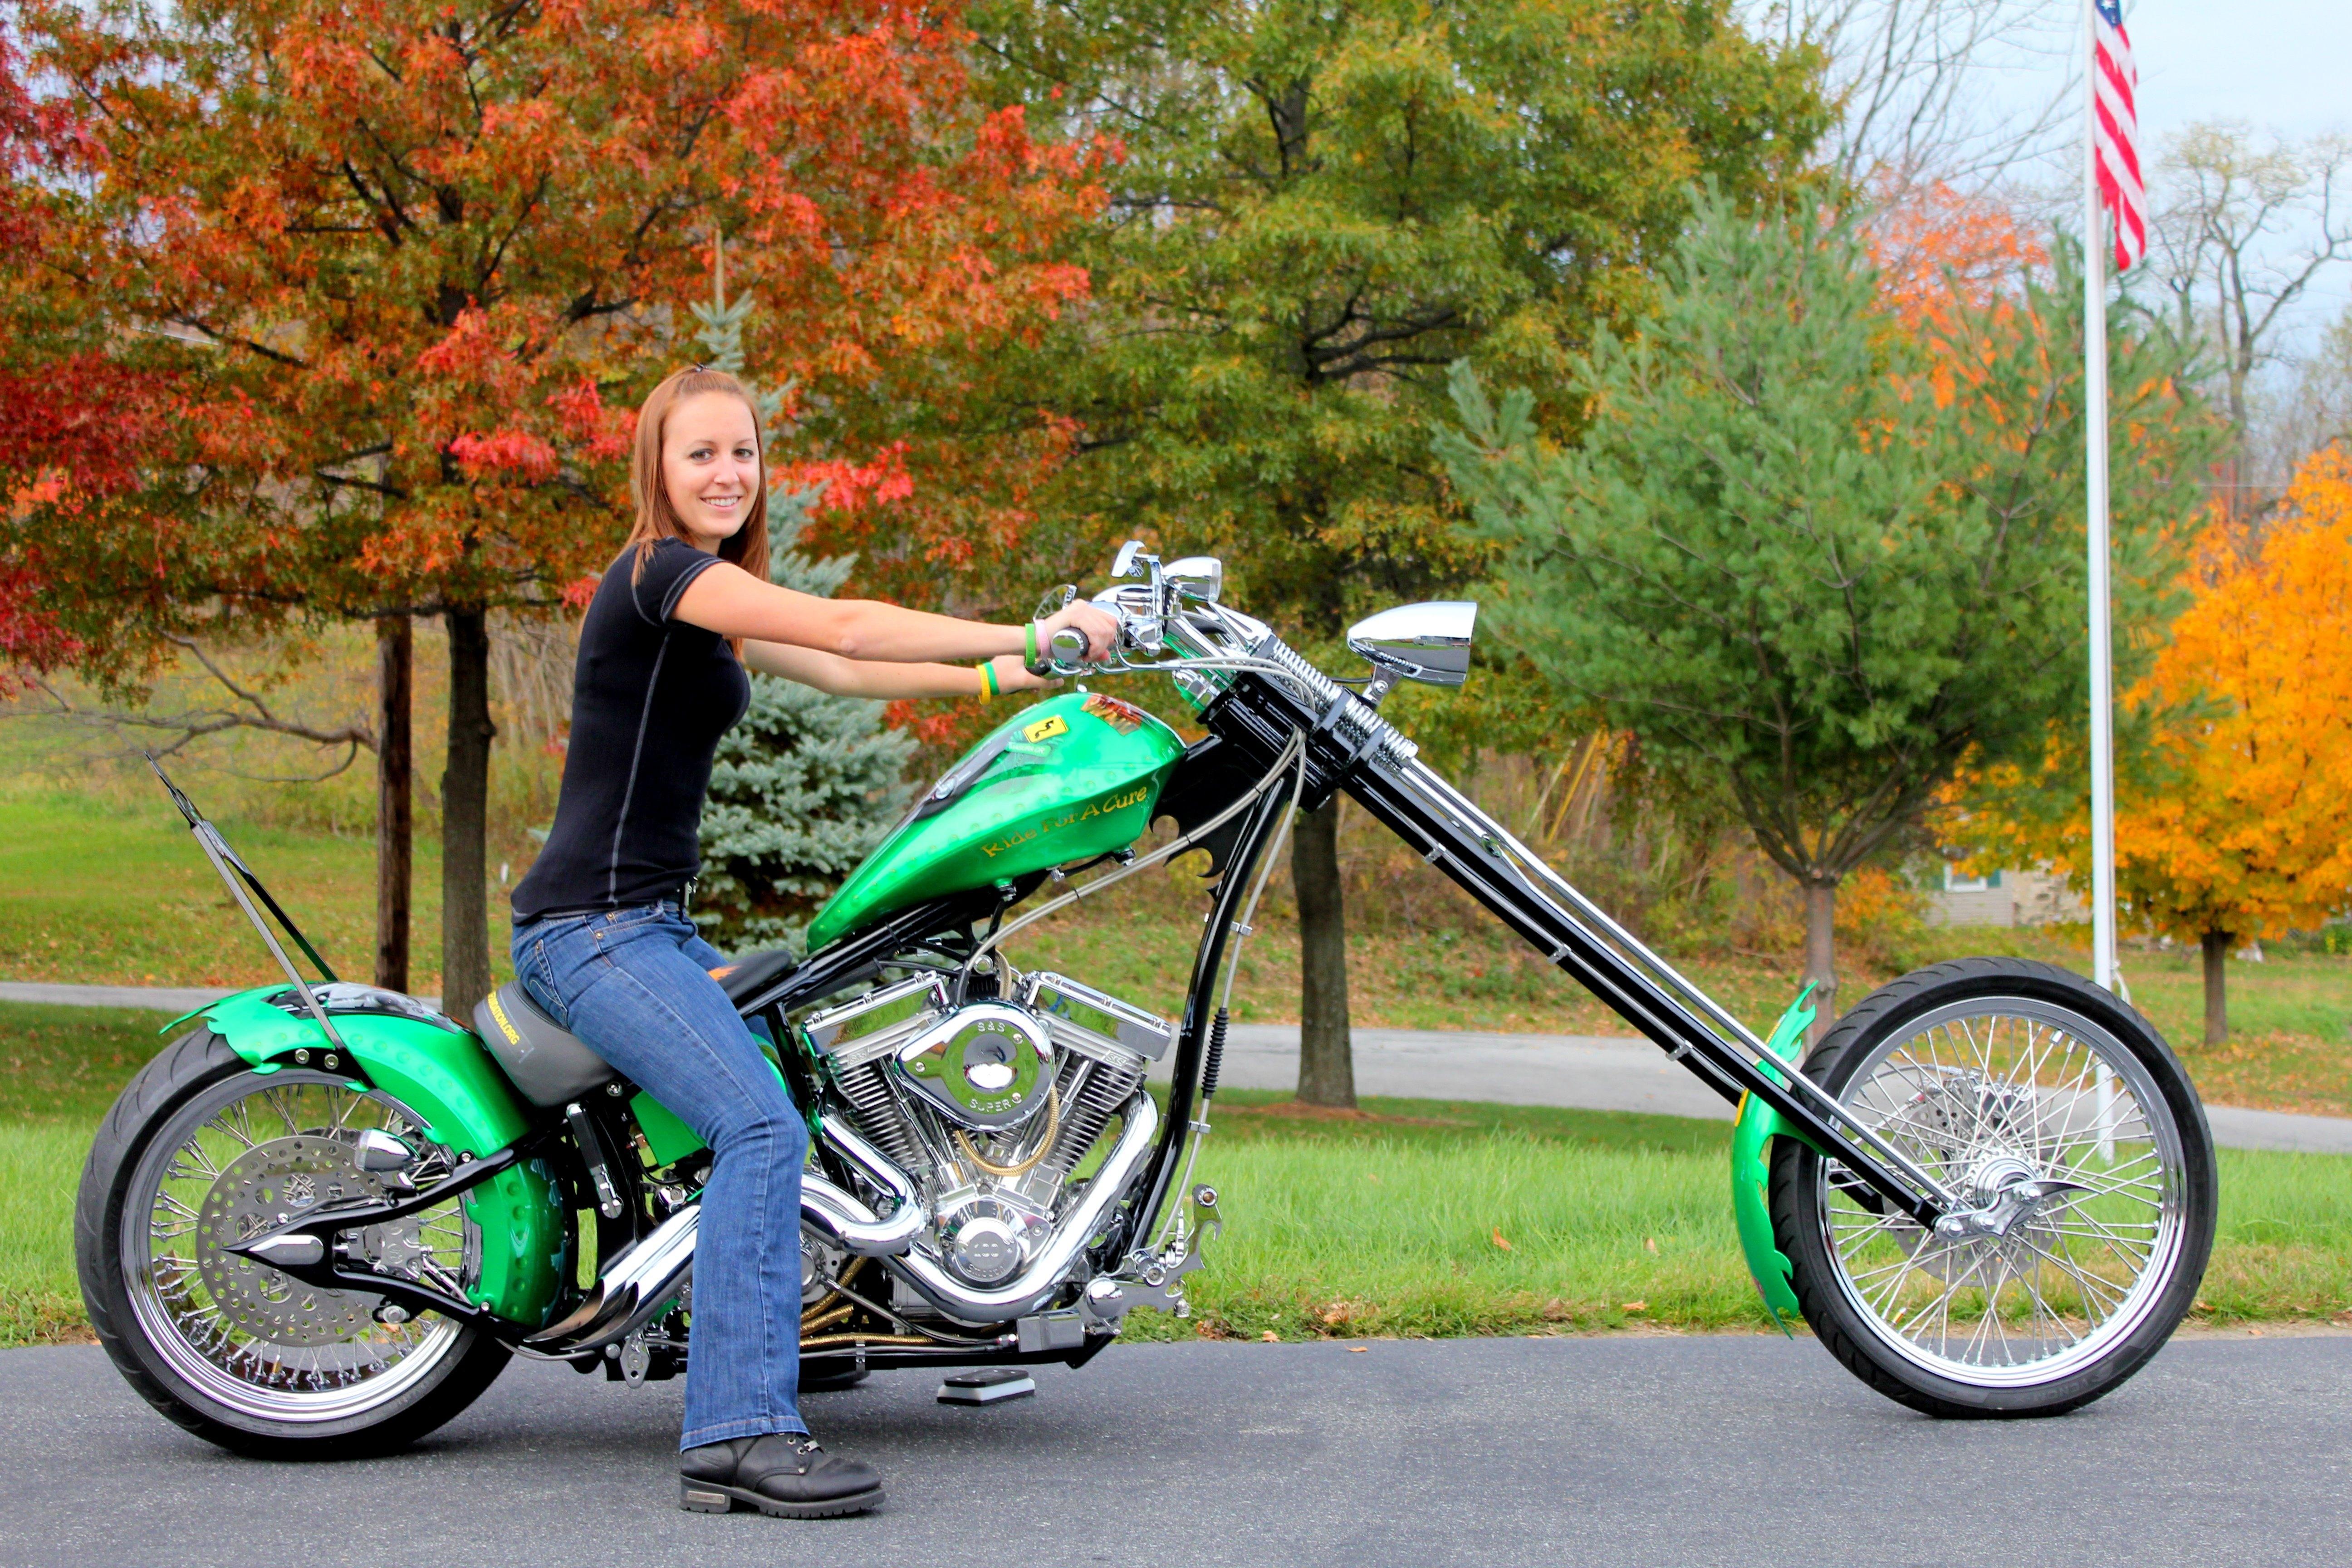 Custom Chopper Motorbike Tuning Bike Hot Rod Rods G Wallpaper 5184x3456 200299 Wallpaperup